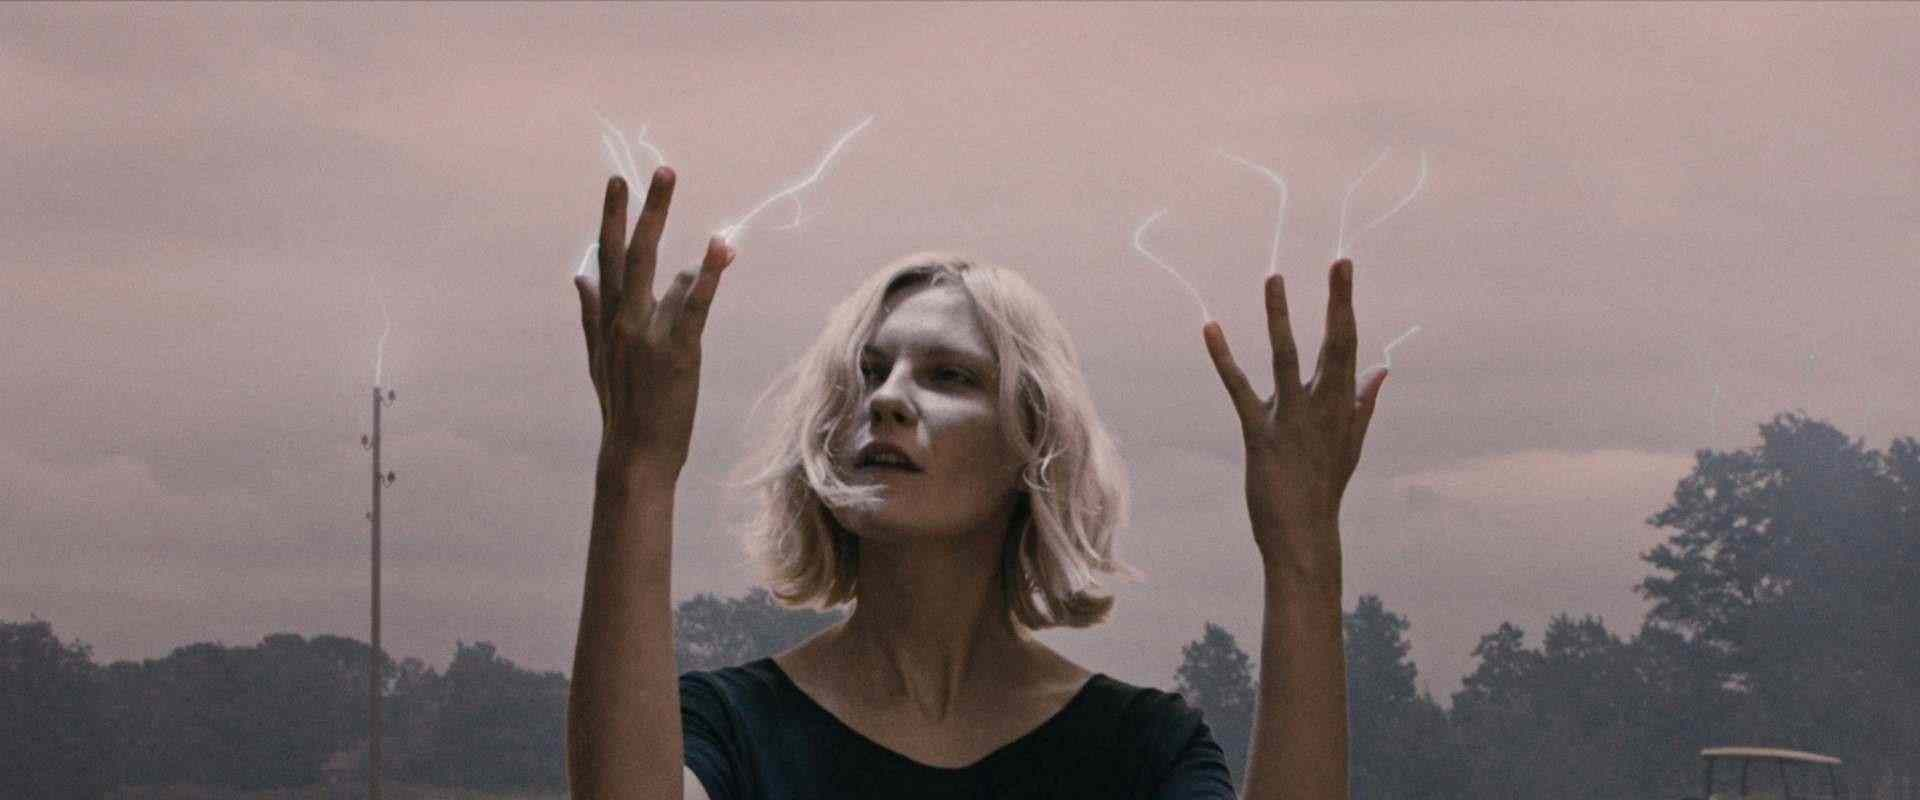 Melancholia filme apocaliptice